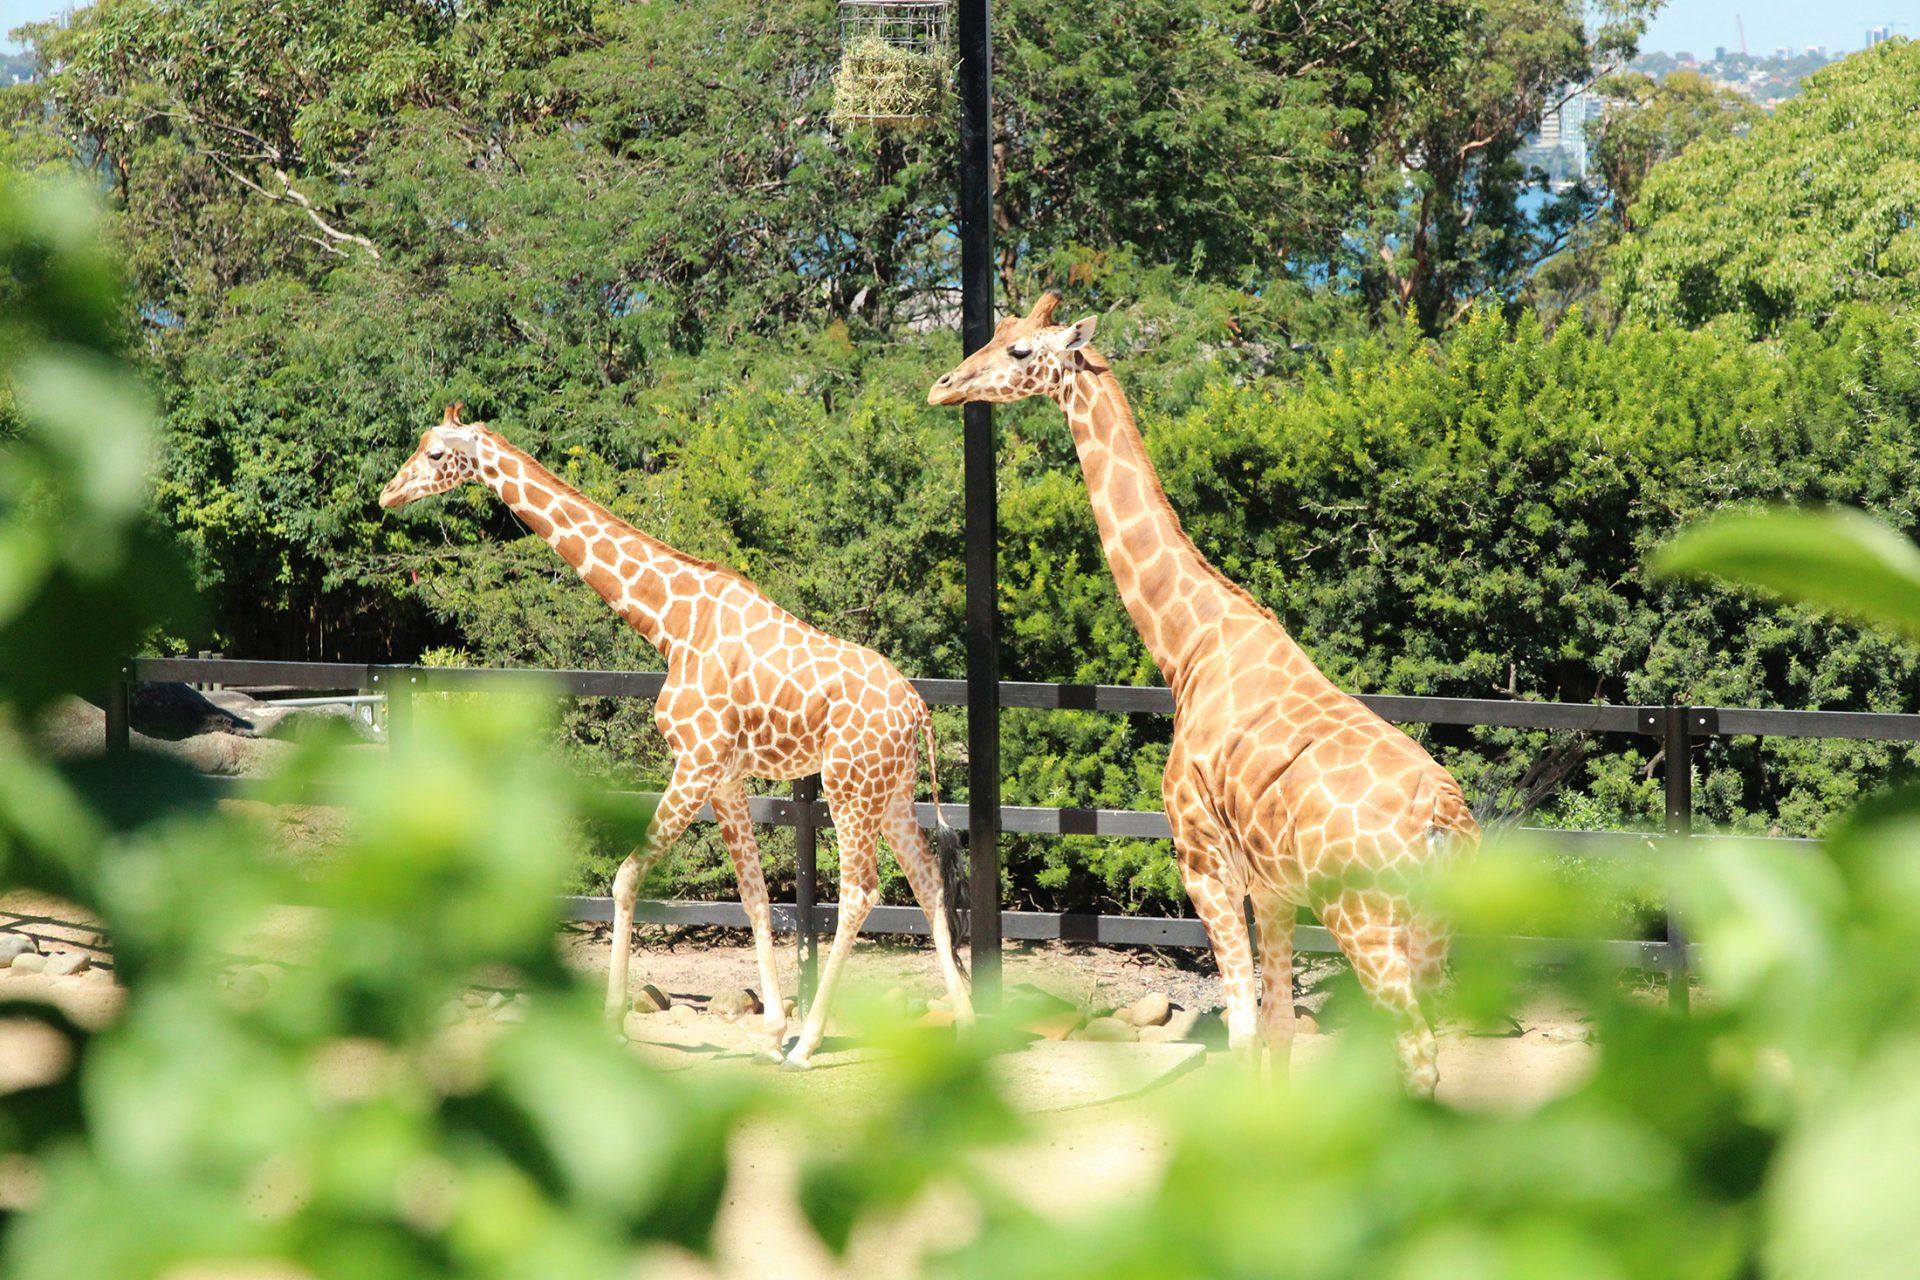 Is Taronga Zoo worth the admission price?